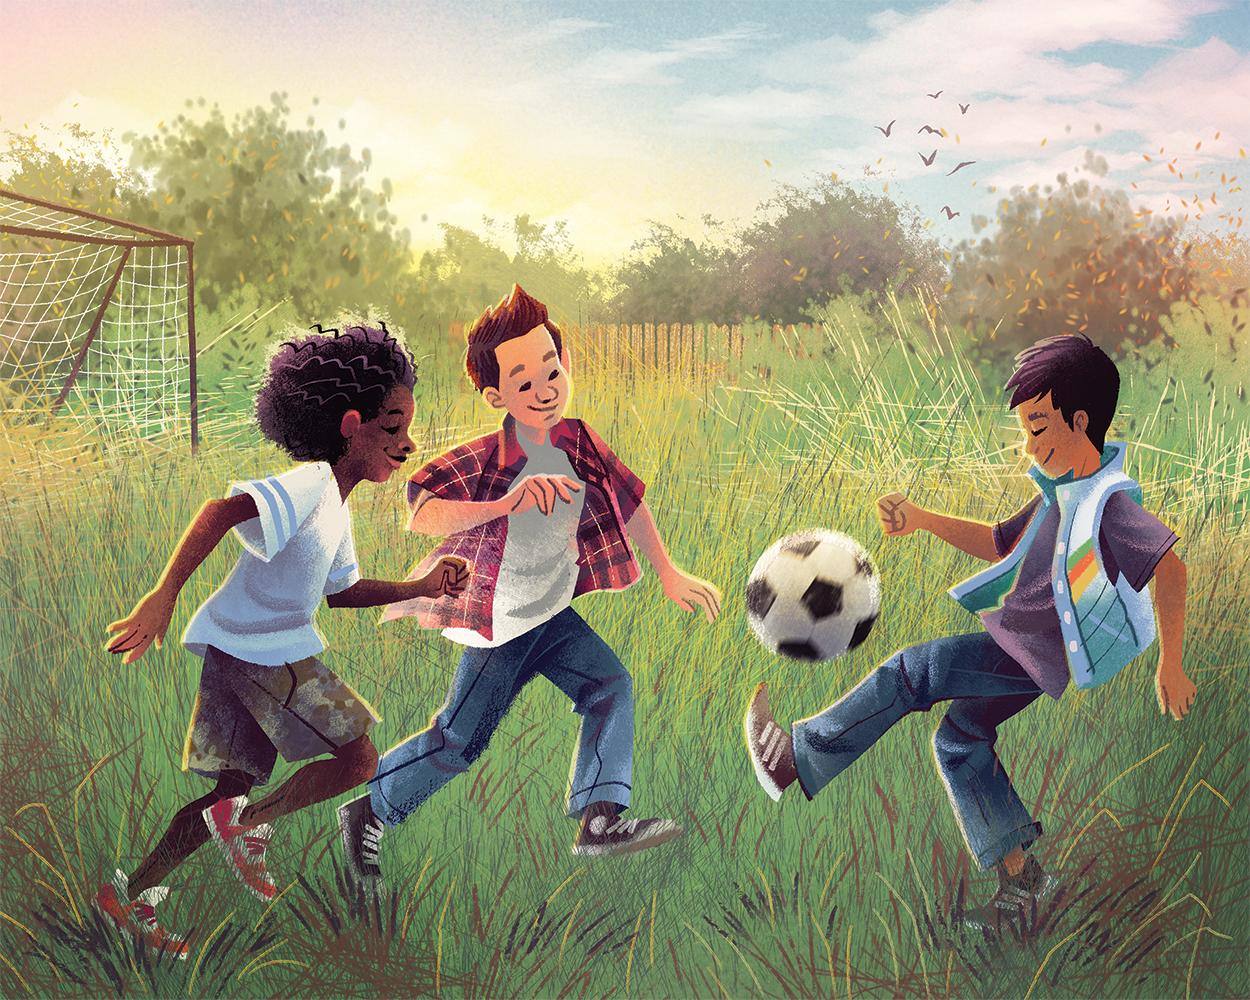 soccer kids Valerie Valdivia.jpg